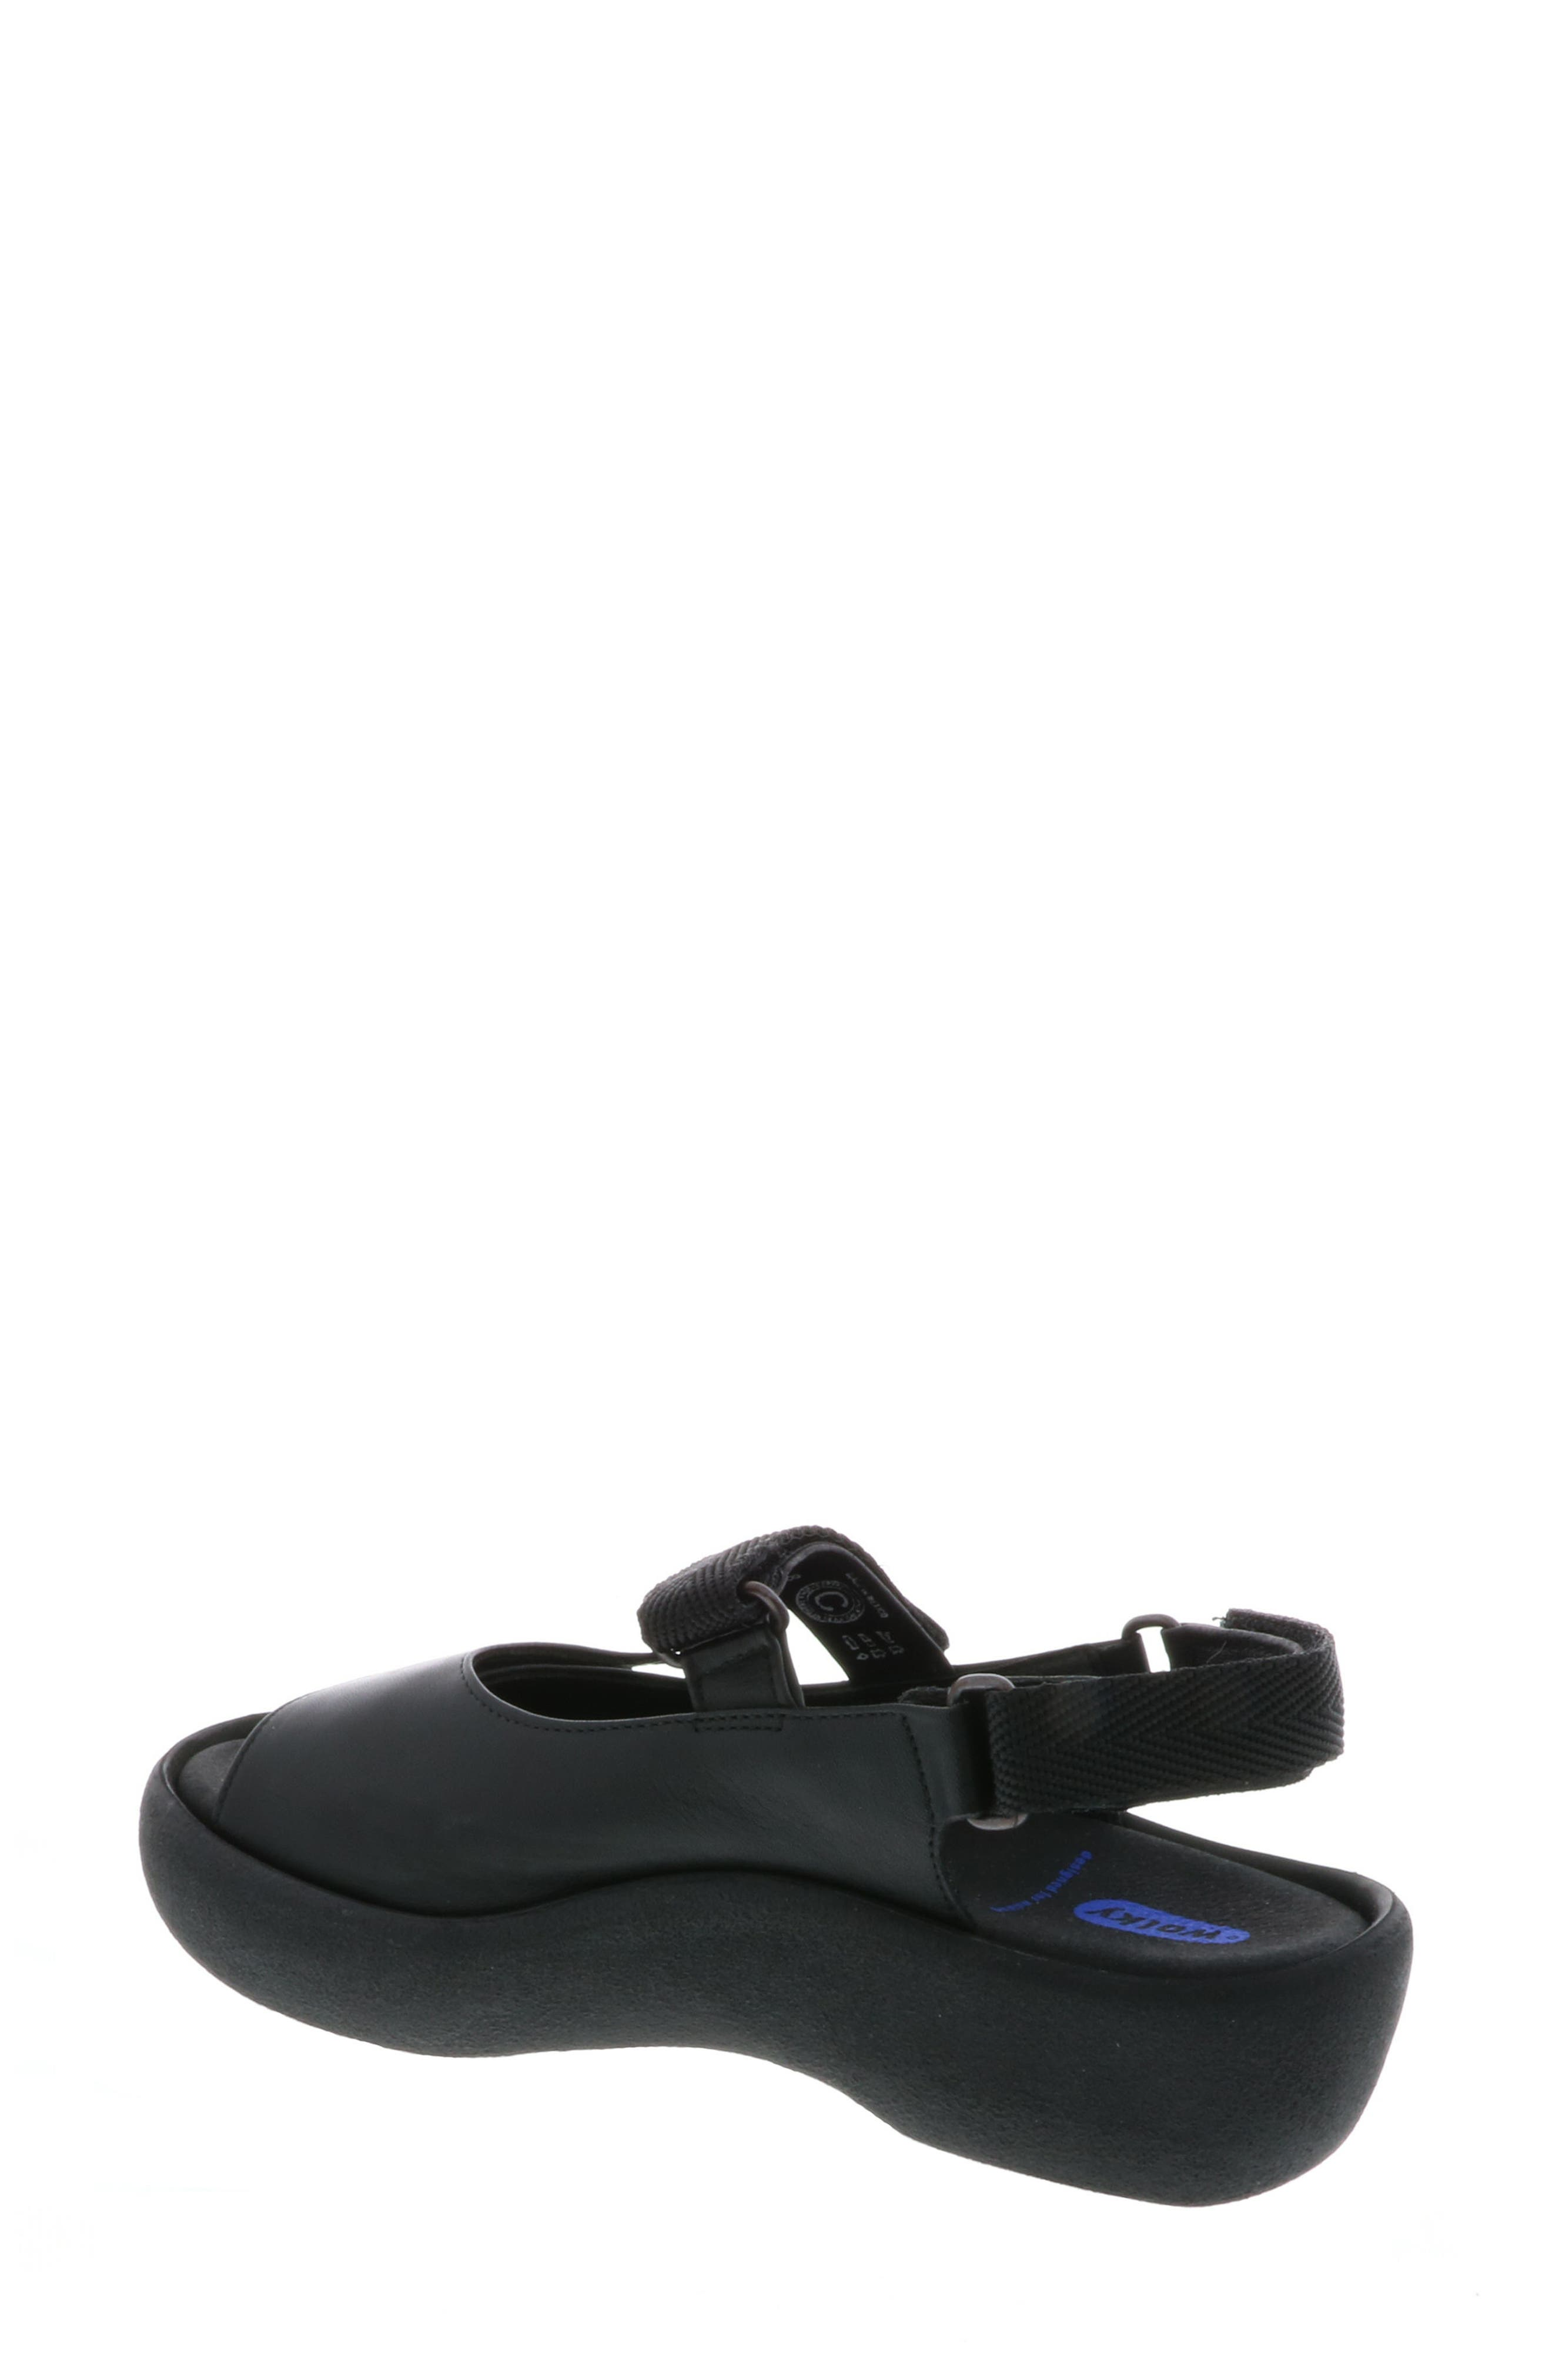 WOLKY, Jewel Sport Sandal, Alternate thumbnail 2, color, BLACK/ BLACK